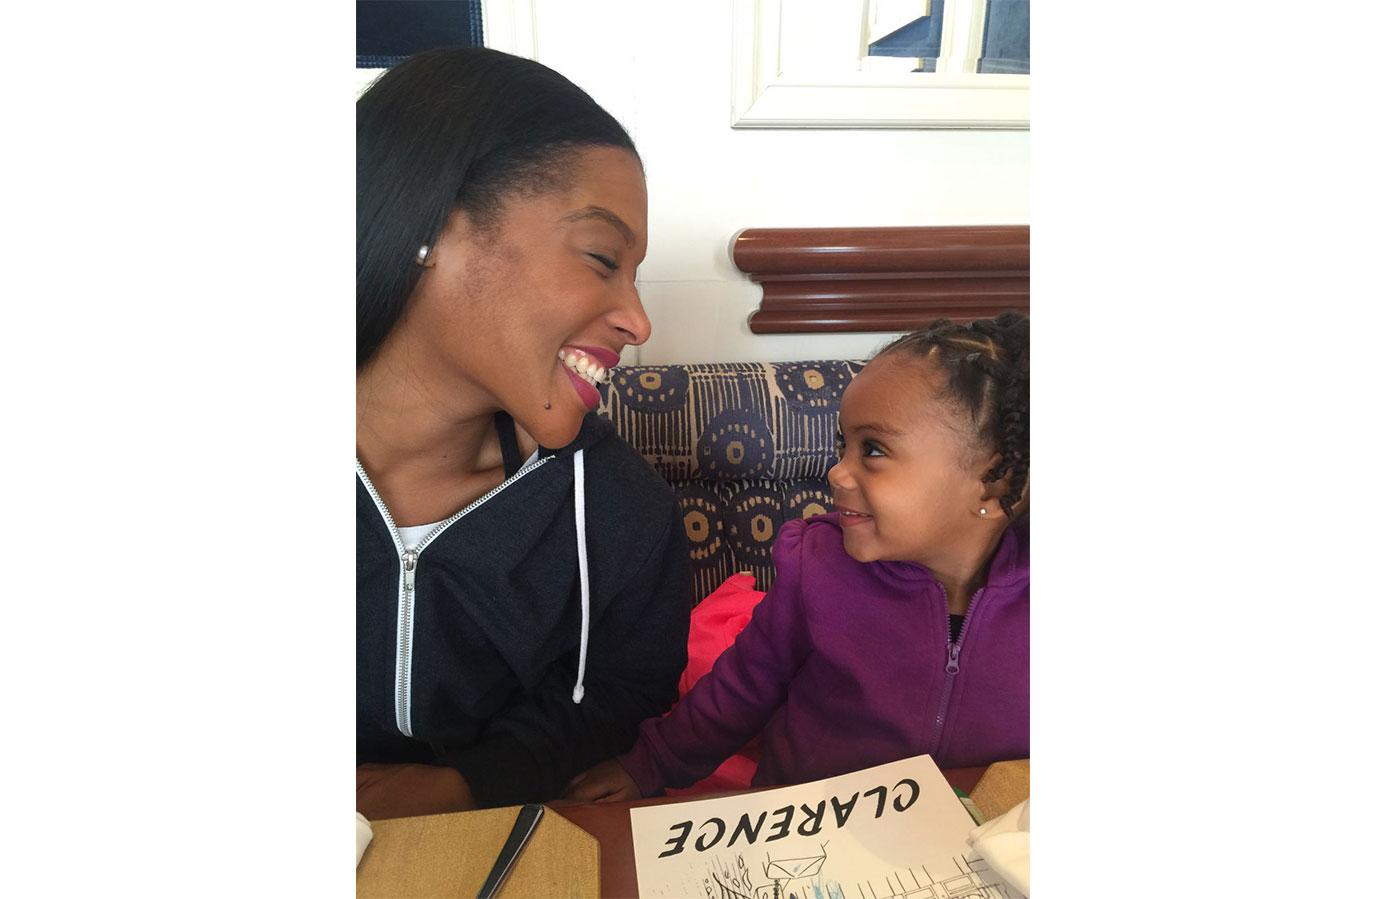 Find Your Grind Co-Founder Jasmine Desilva with Daughter - FYG, Bermuda